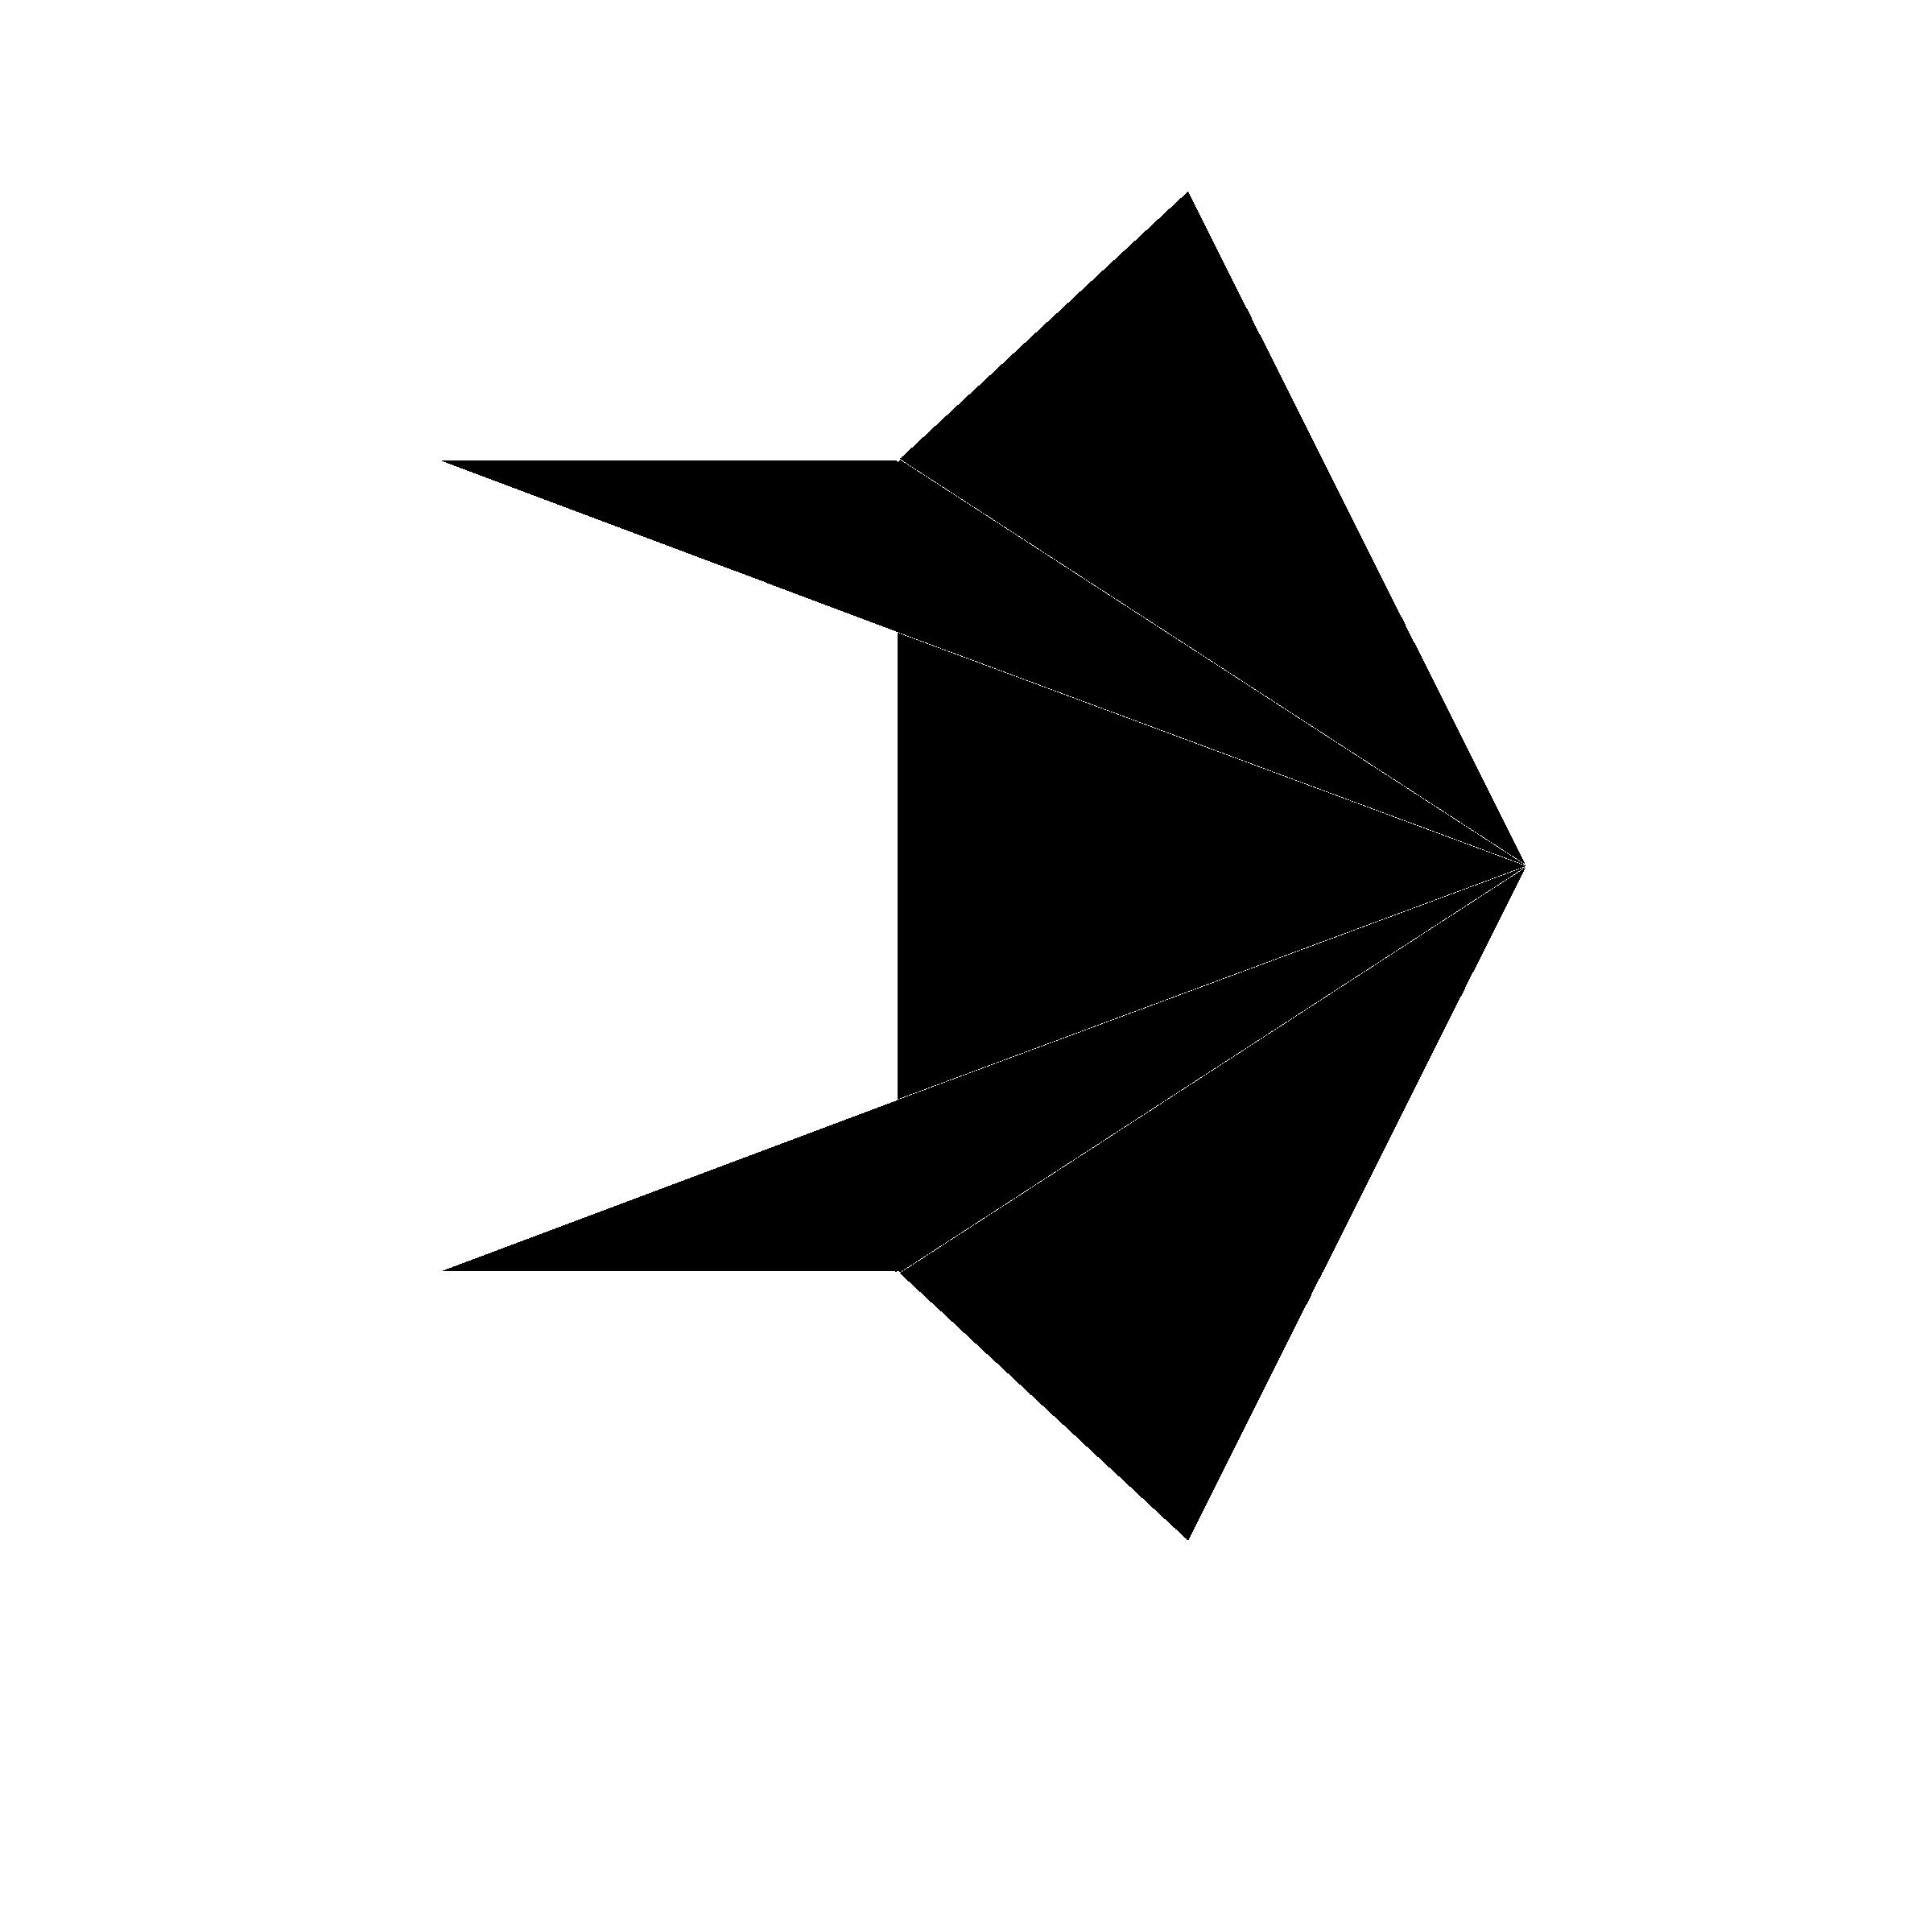 3ds max full logo png transparent amp svg vector freebie